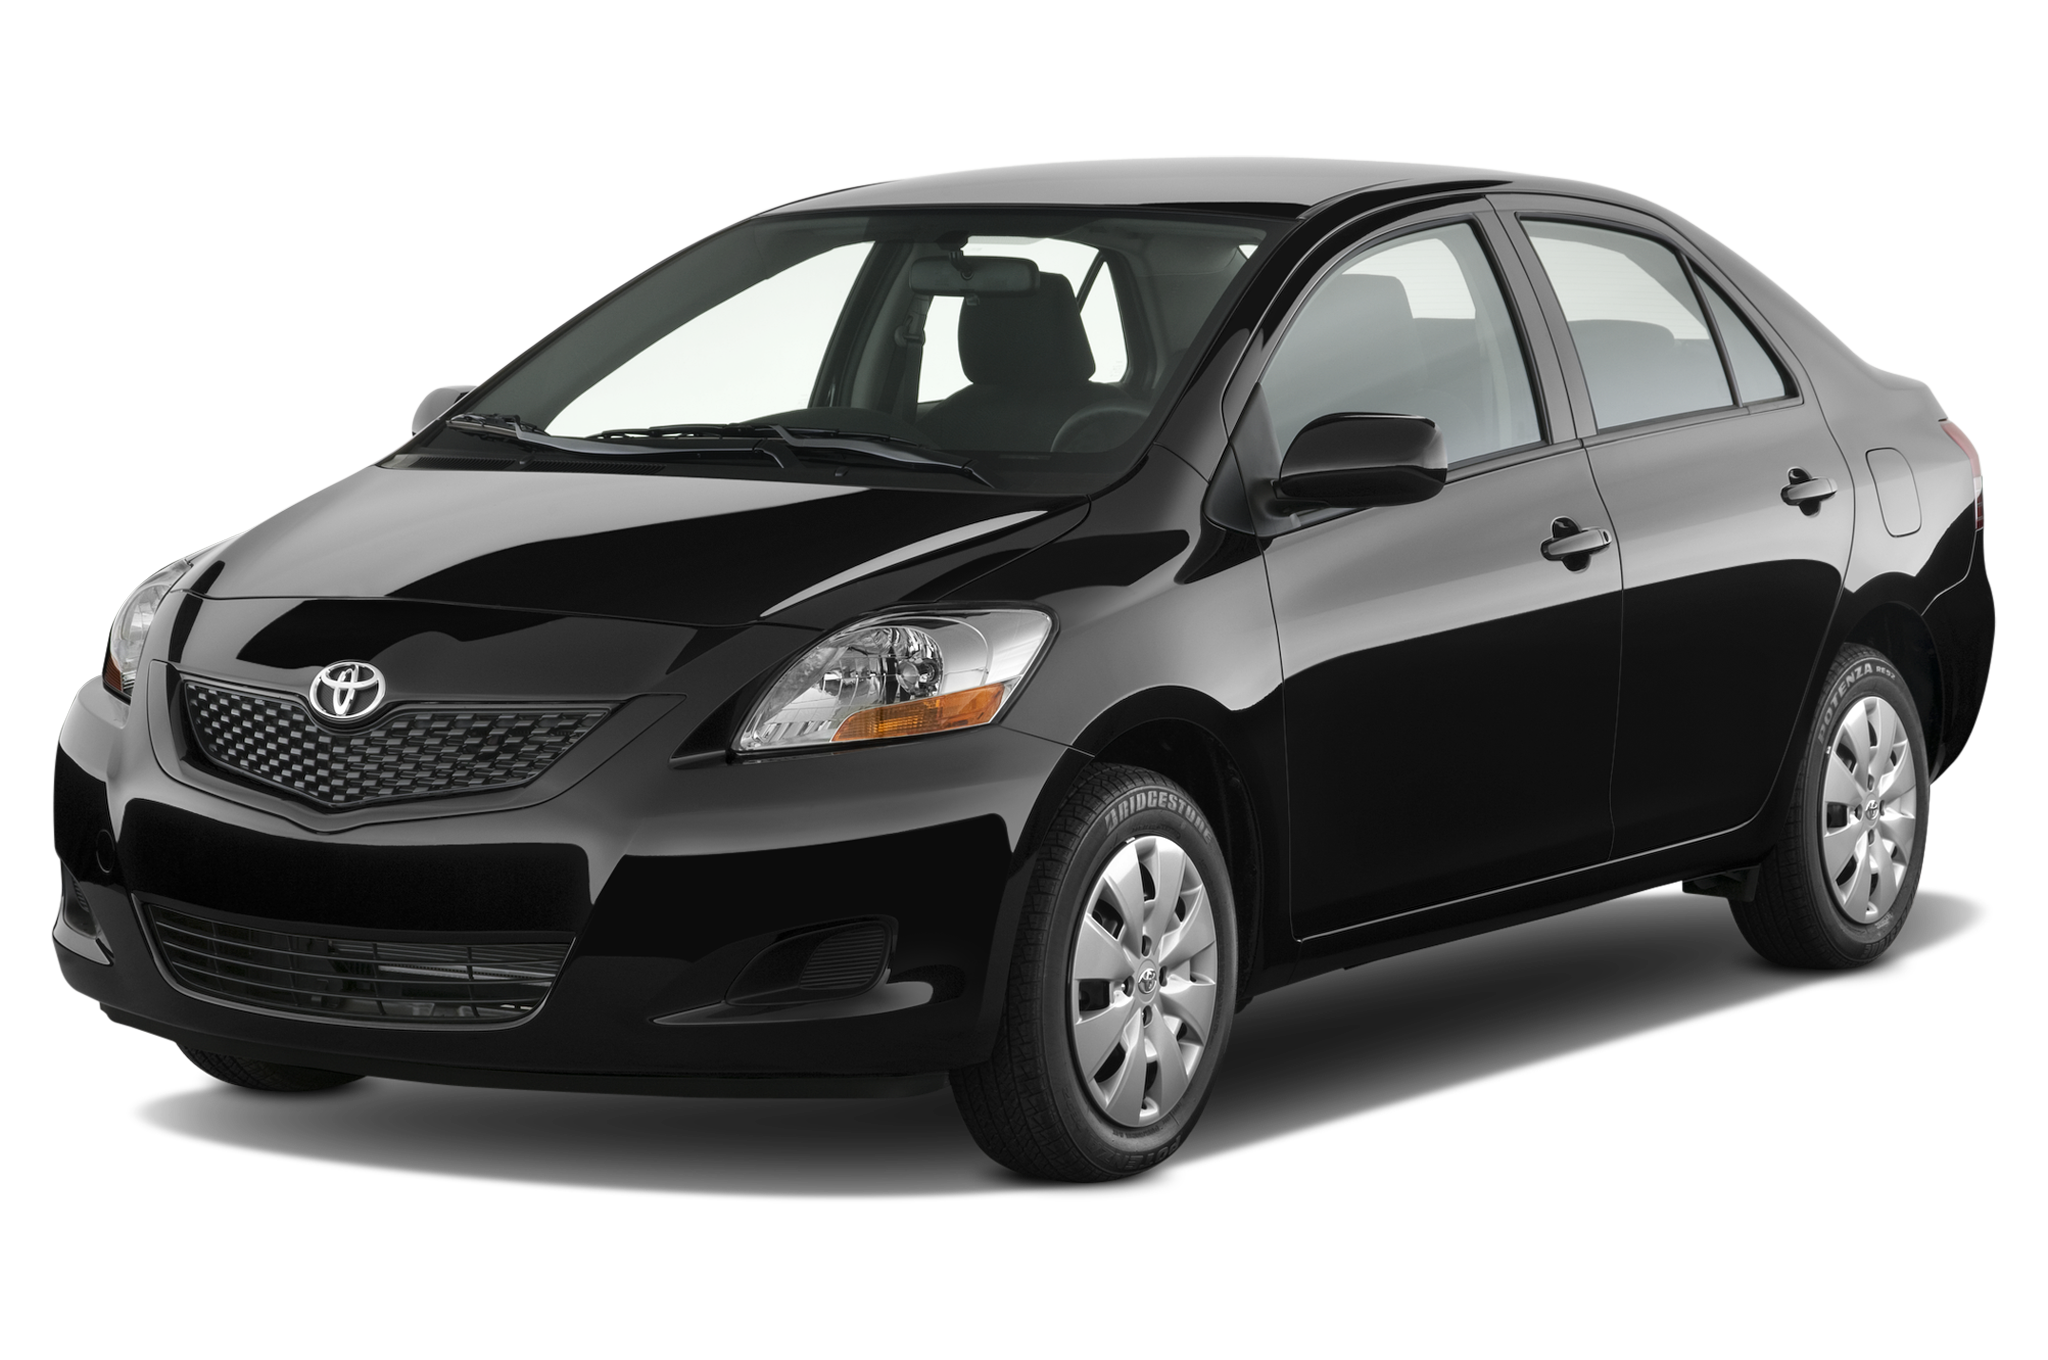 Toyota Yaris II 2005 - 2009 Sedan #2